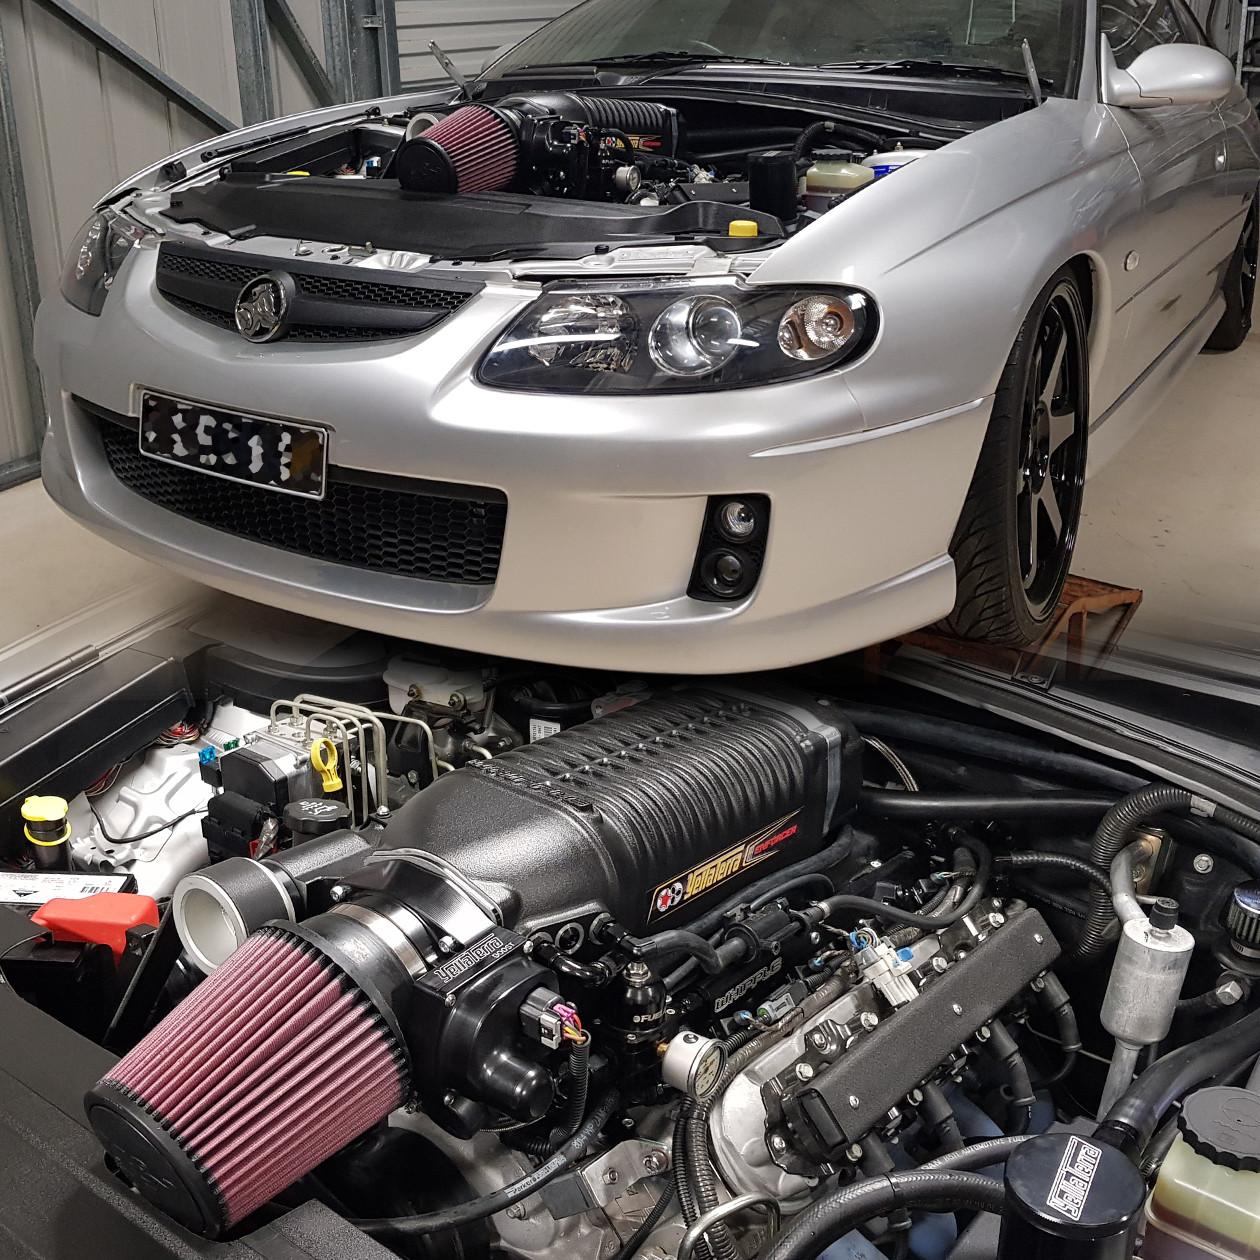 04 2004 PONTIAC GTO G T O 5.7 5.7L//6.0 6.0L V8 FULL AIR INTAKE KIT RED